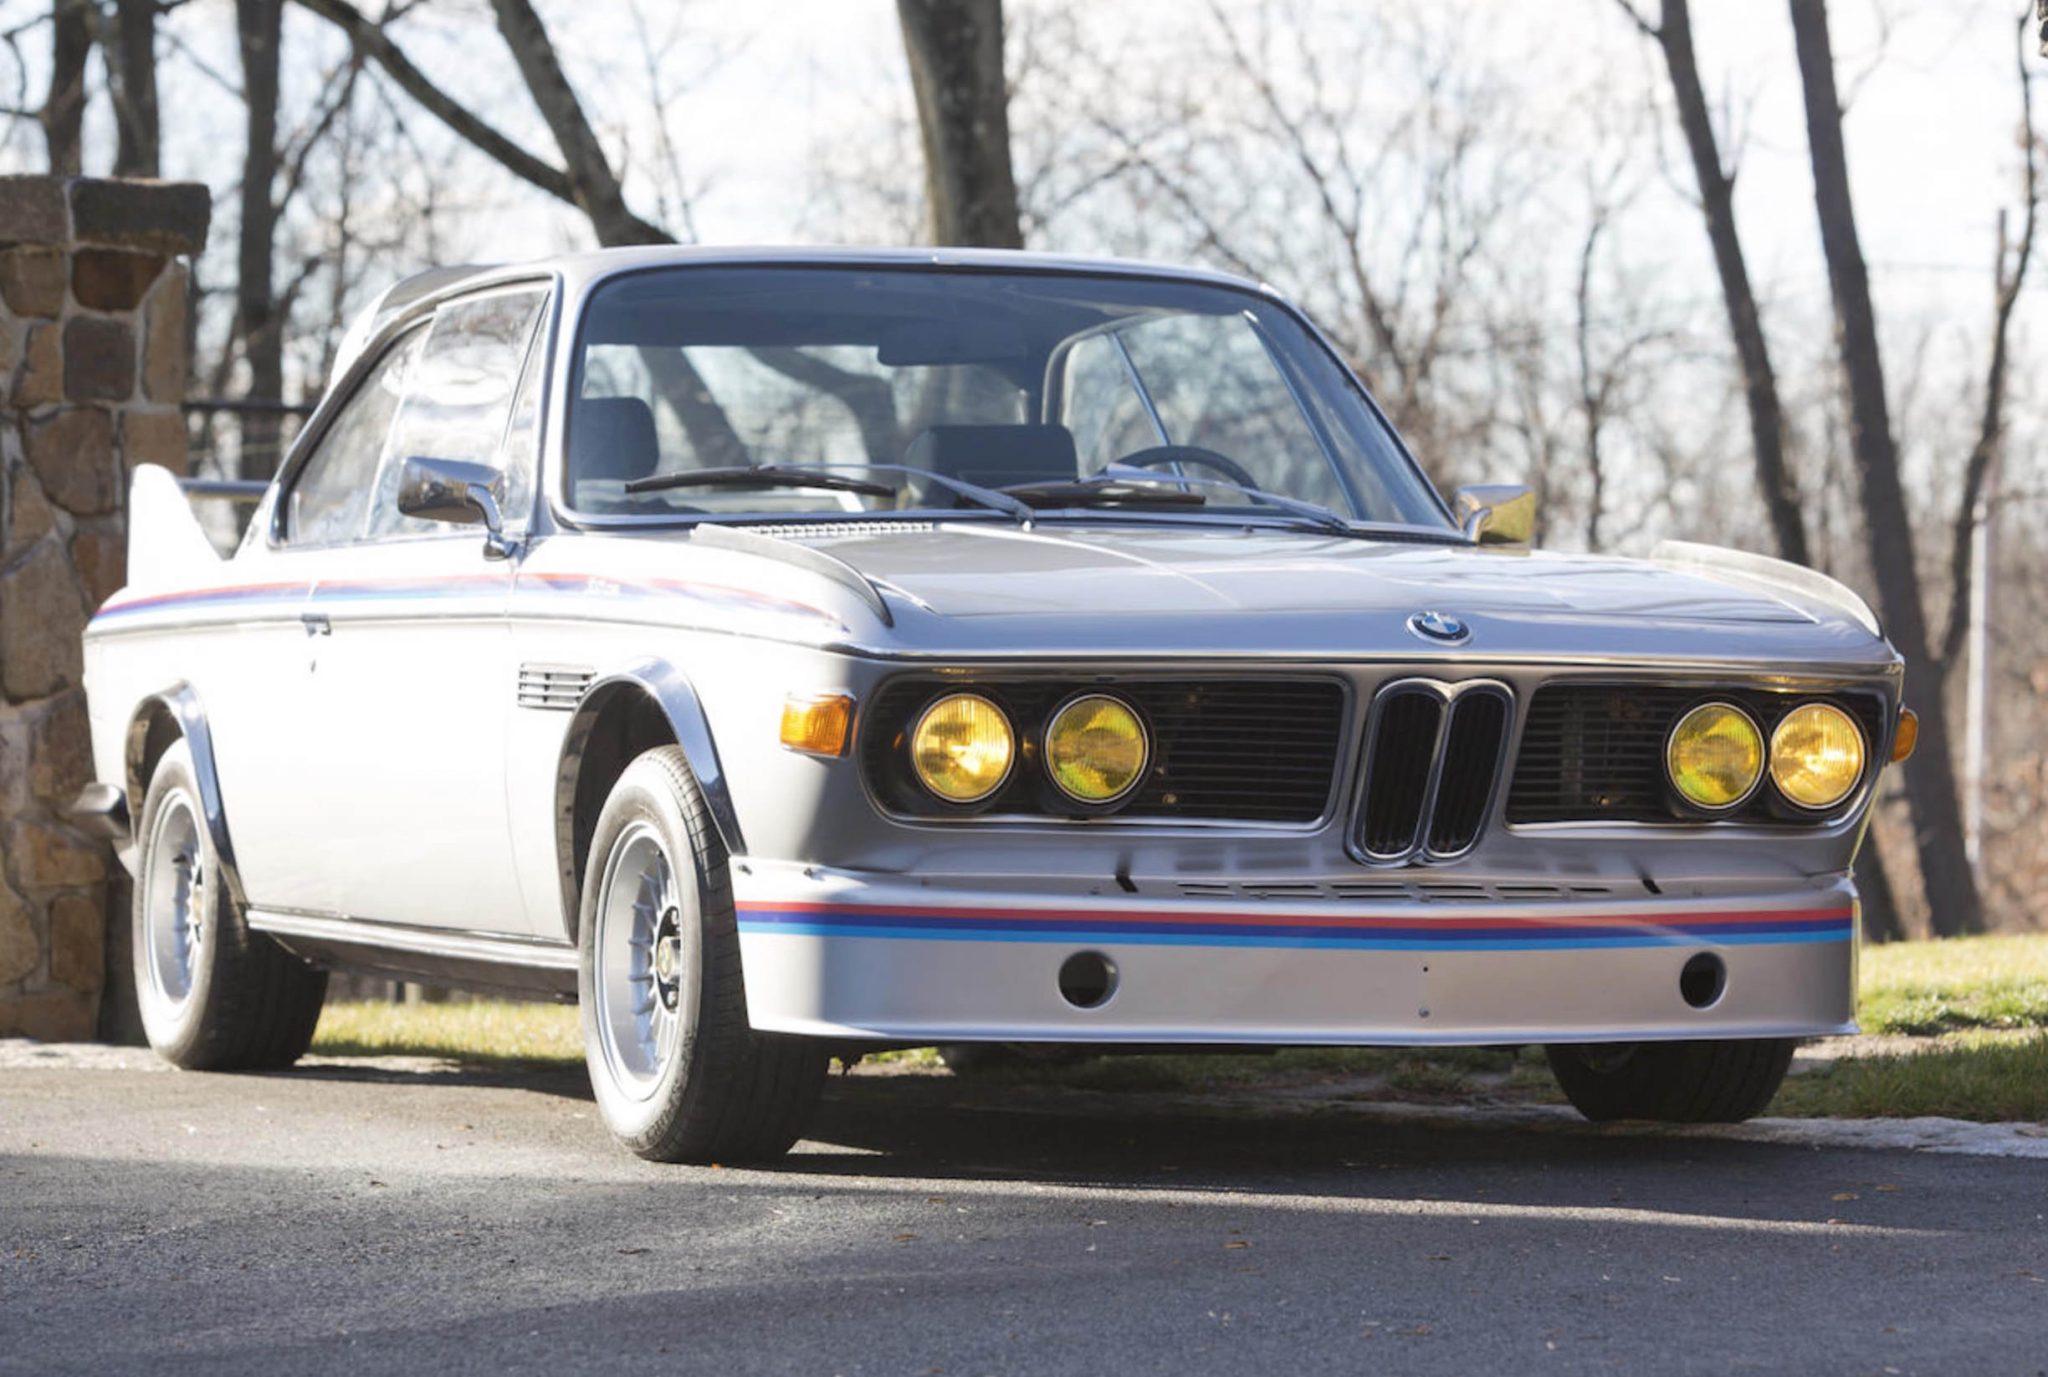 BMW 3.0 Csl >> 1973 BMW 3.0 CSL Batmobile